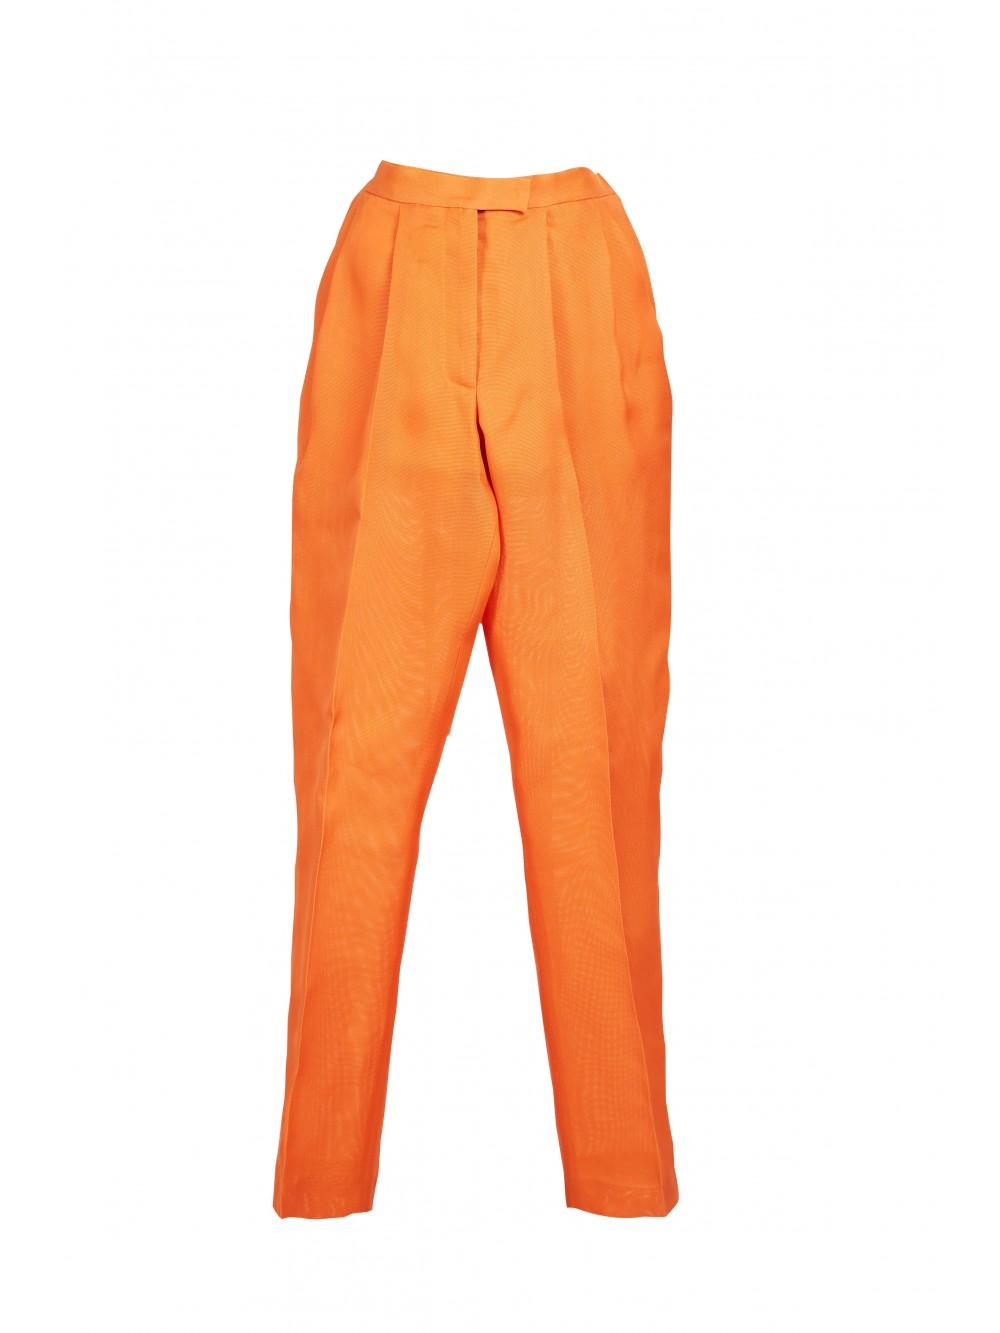 Oversized asymmetric suit matching trousers |  Joy